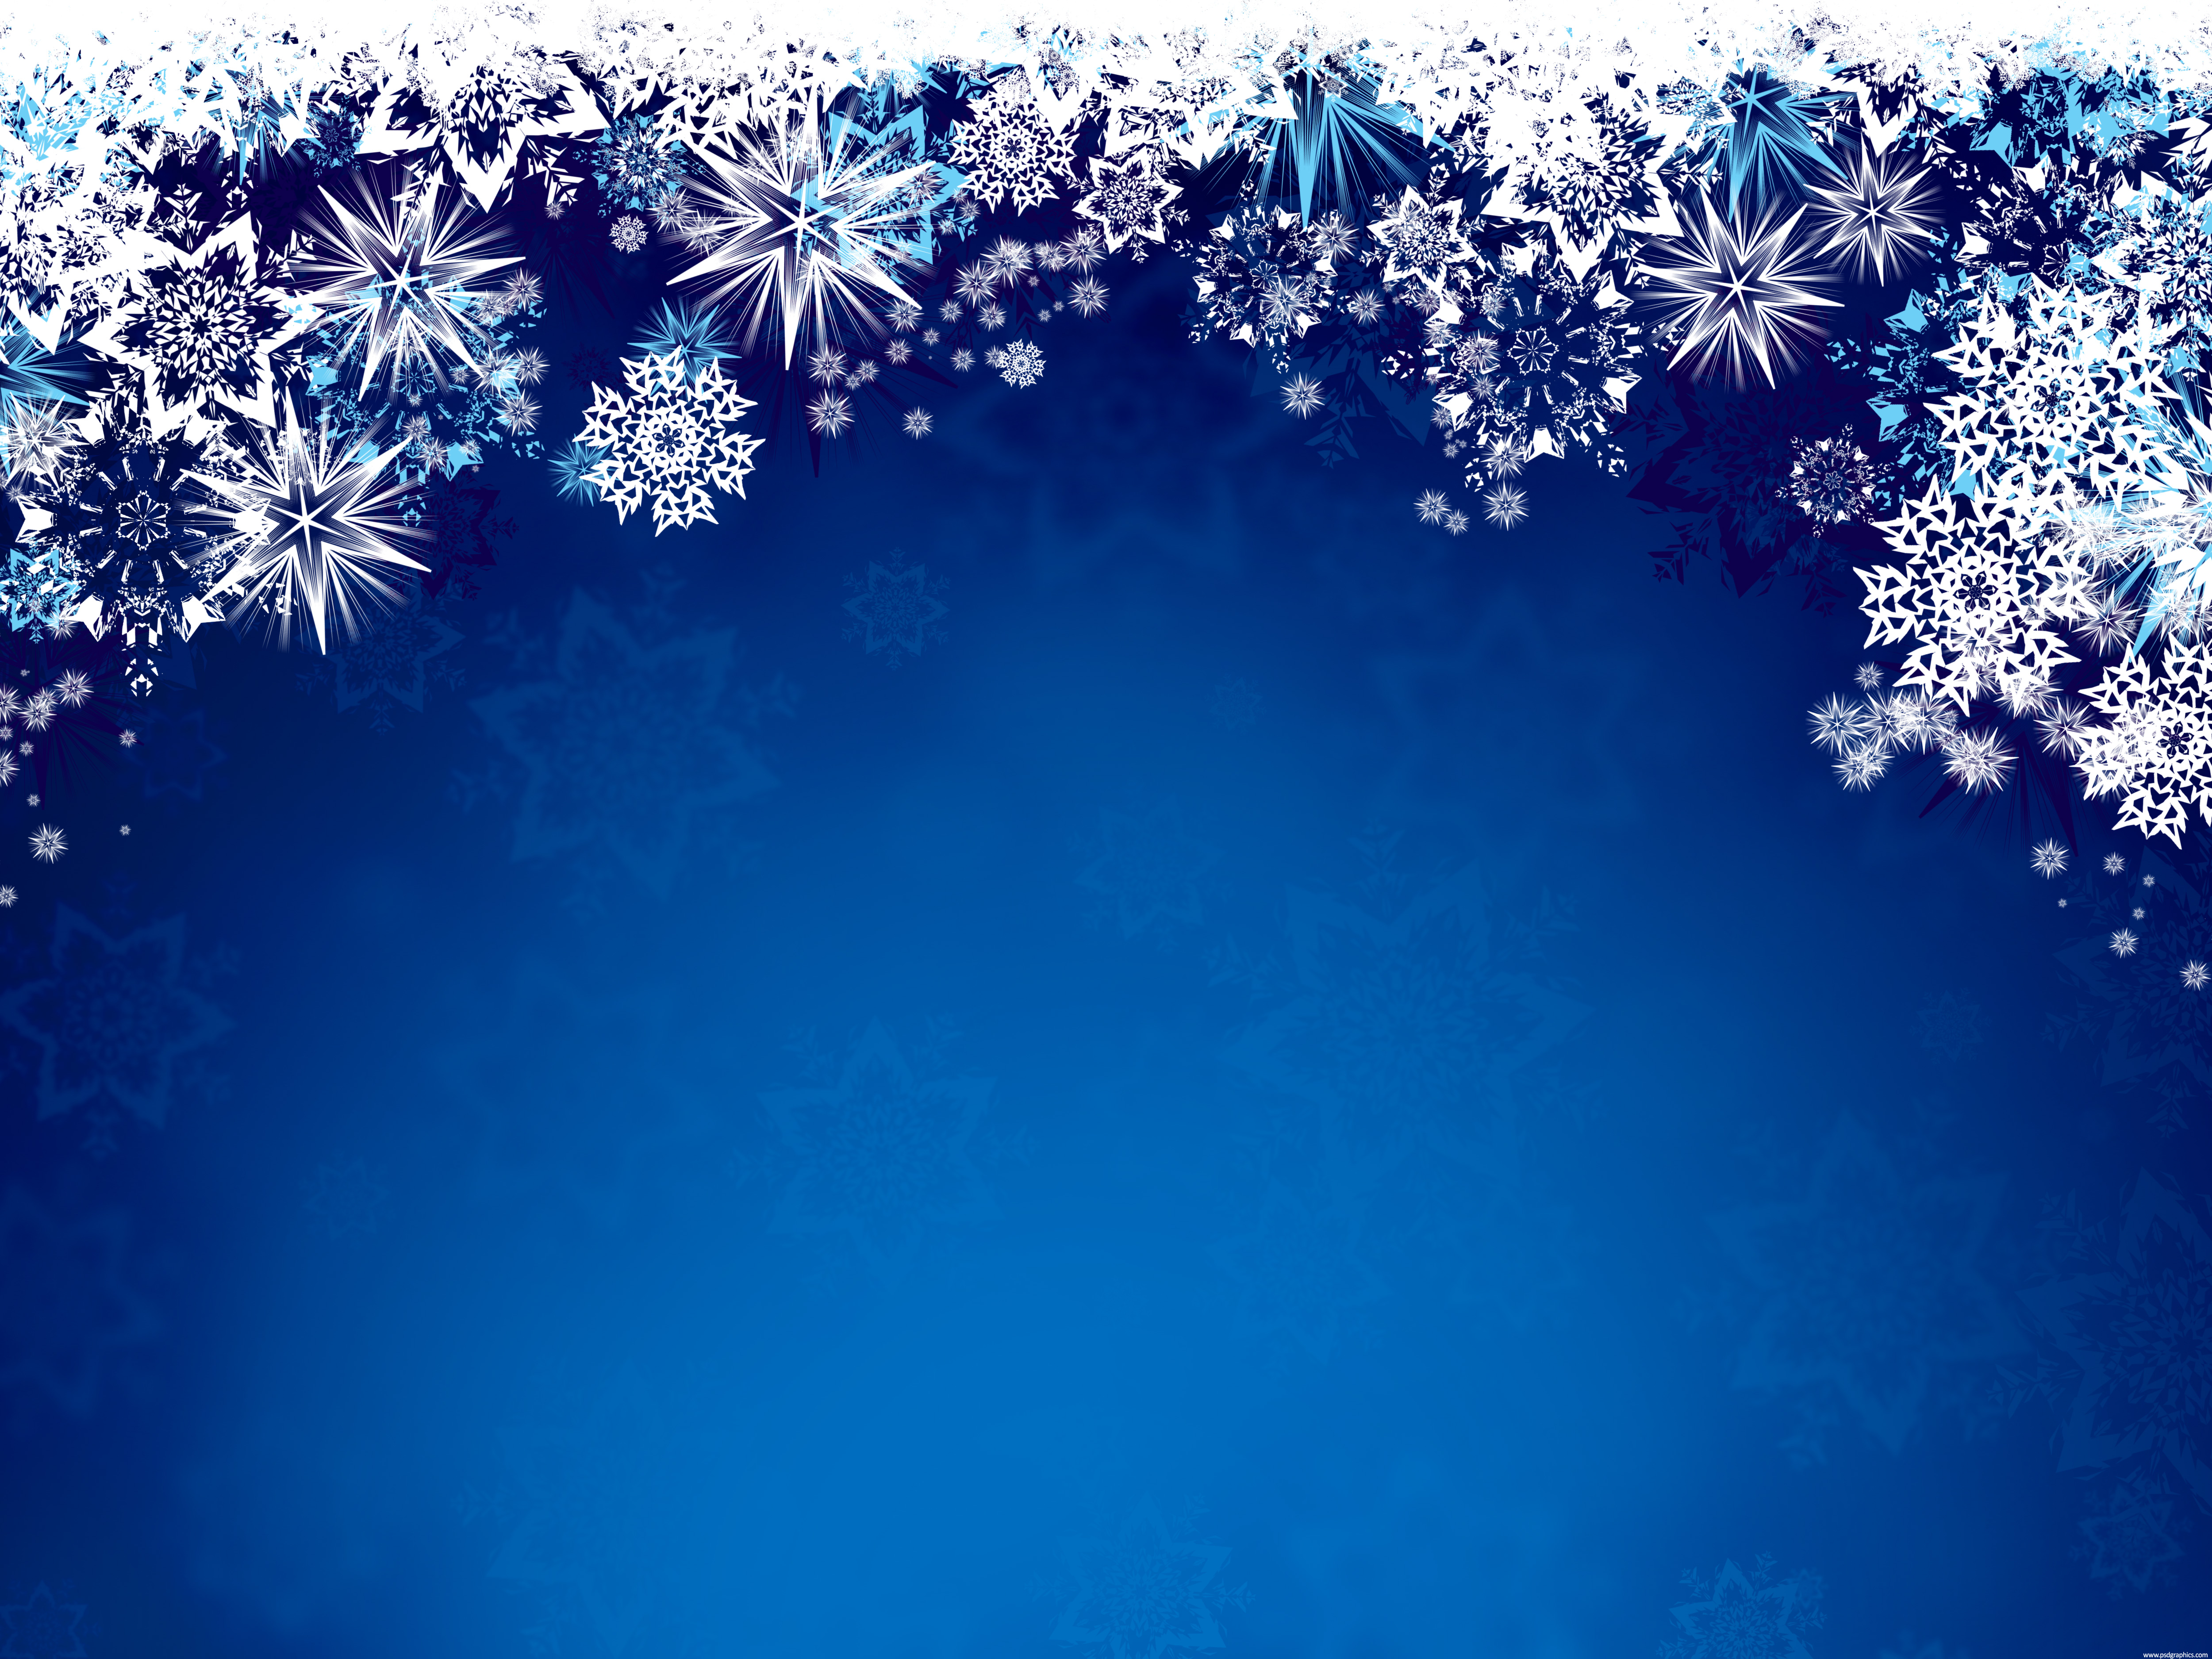 magic winter snowflakes grungy winter design white snow background set 5000x3750